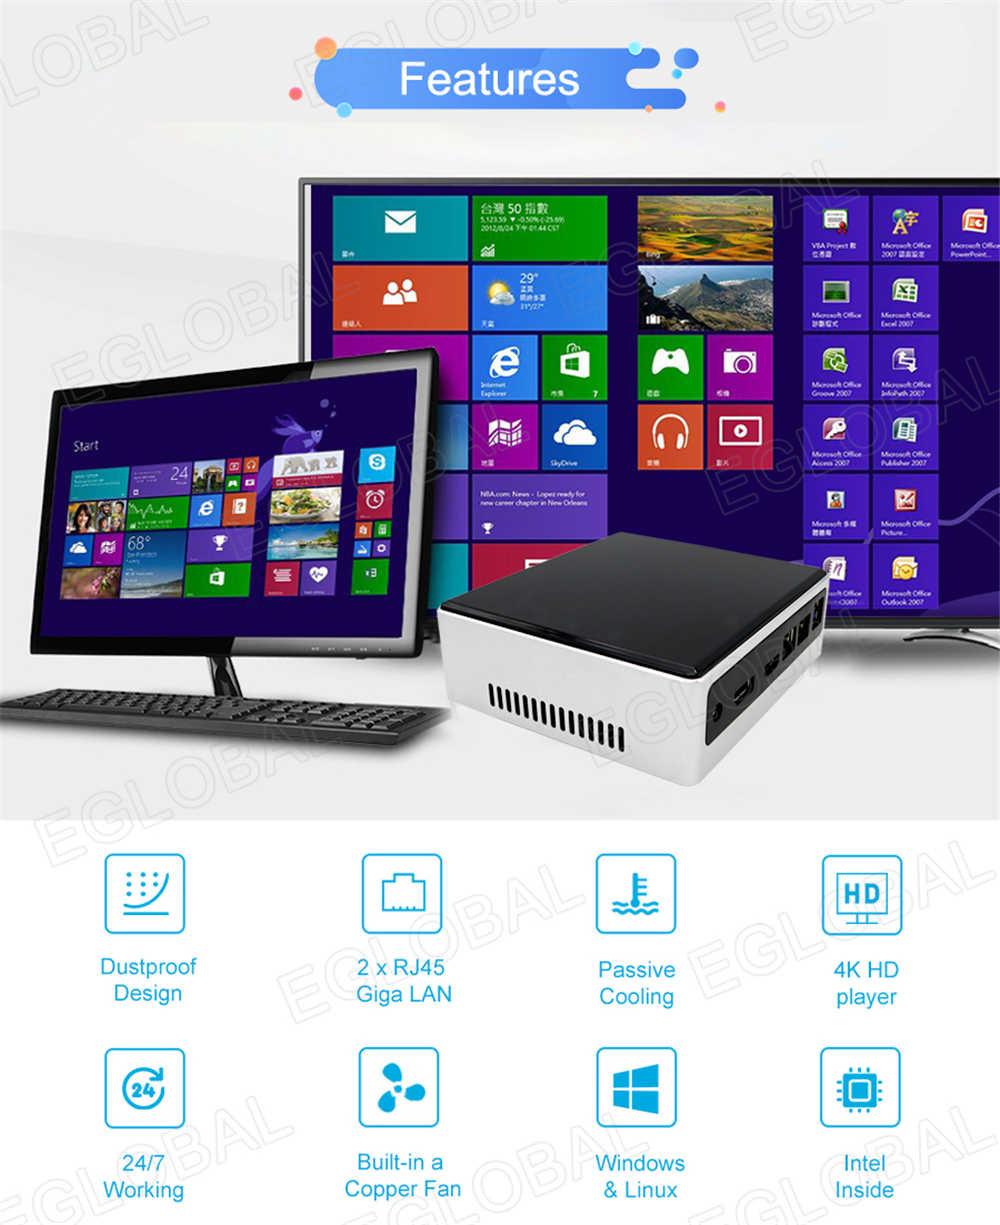 8th Gen Mini PC Intel i7 8550U i5 8250U 4 Core 8 hilos 2 * DDR4 2 * Lans M.2 NVMe NUC computadora Win10 Pro Linux WiFi USB-C DP HDMI